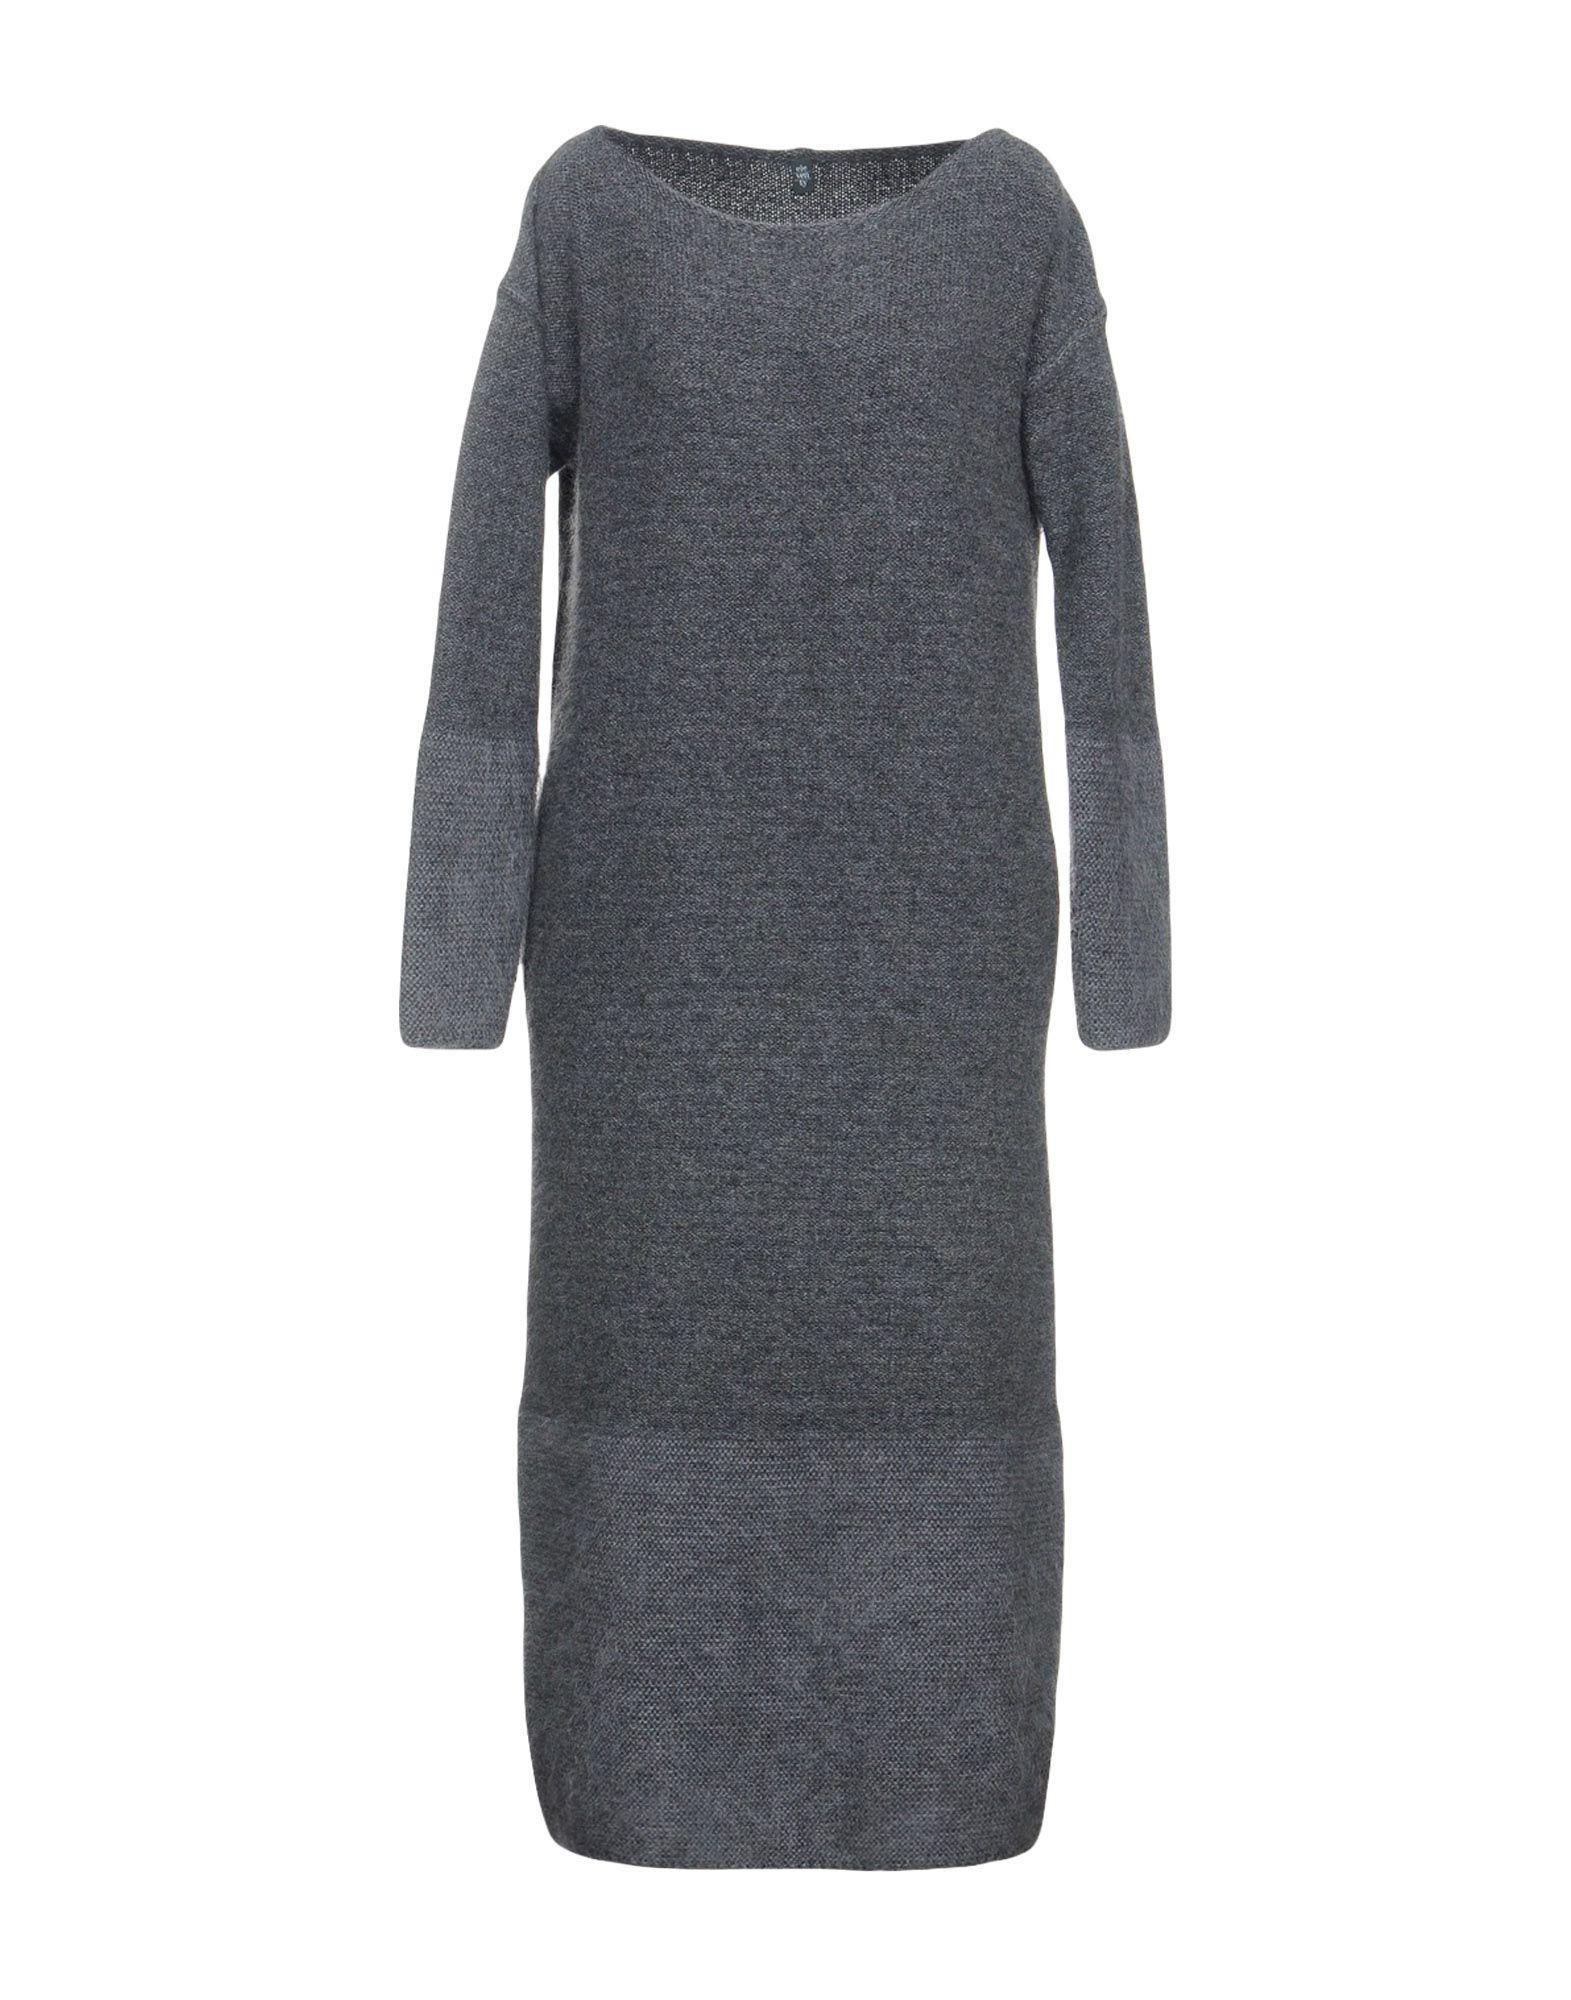 Eleventy Knee-length Dress In Grey